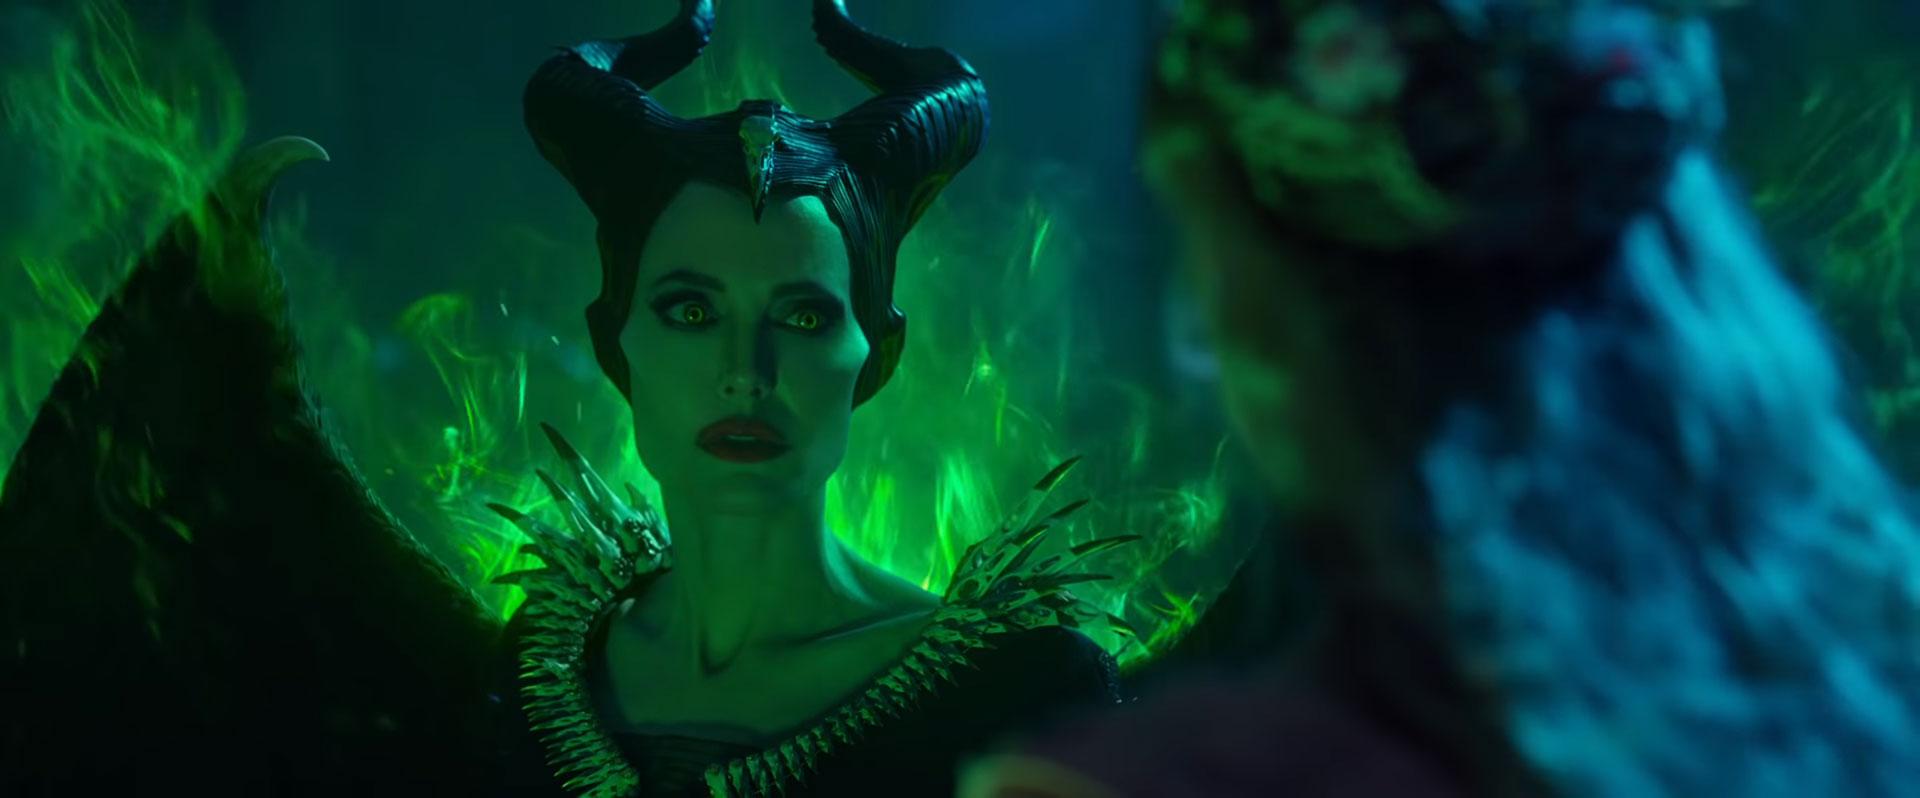 Disney S Maleficent Mistress Of Evil Teaser Trailer